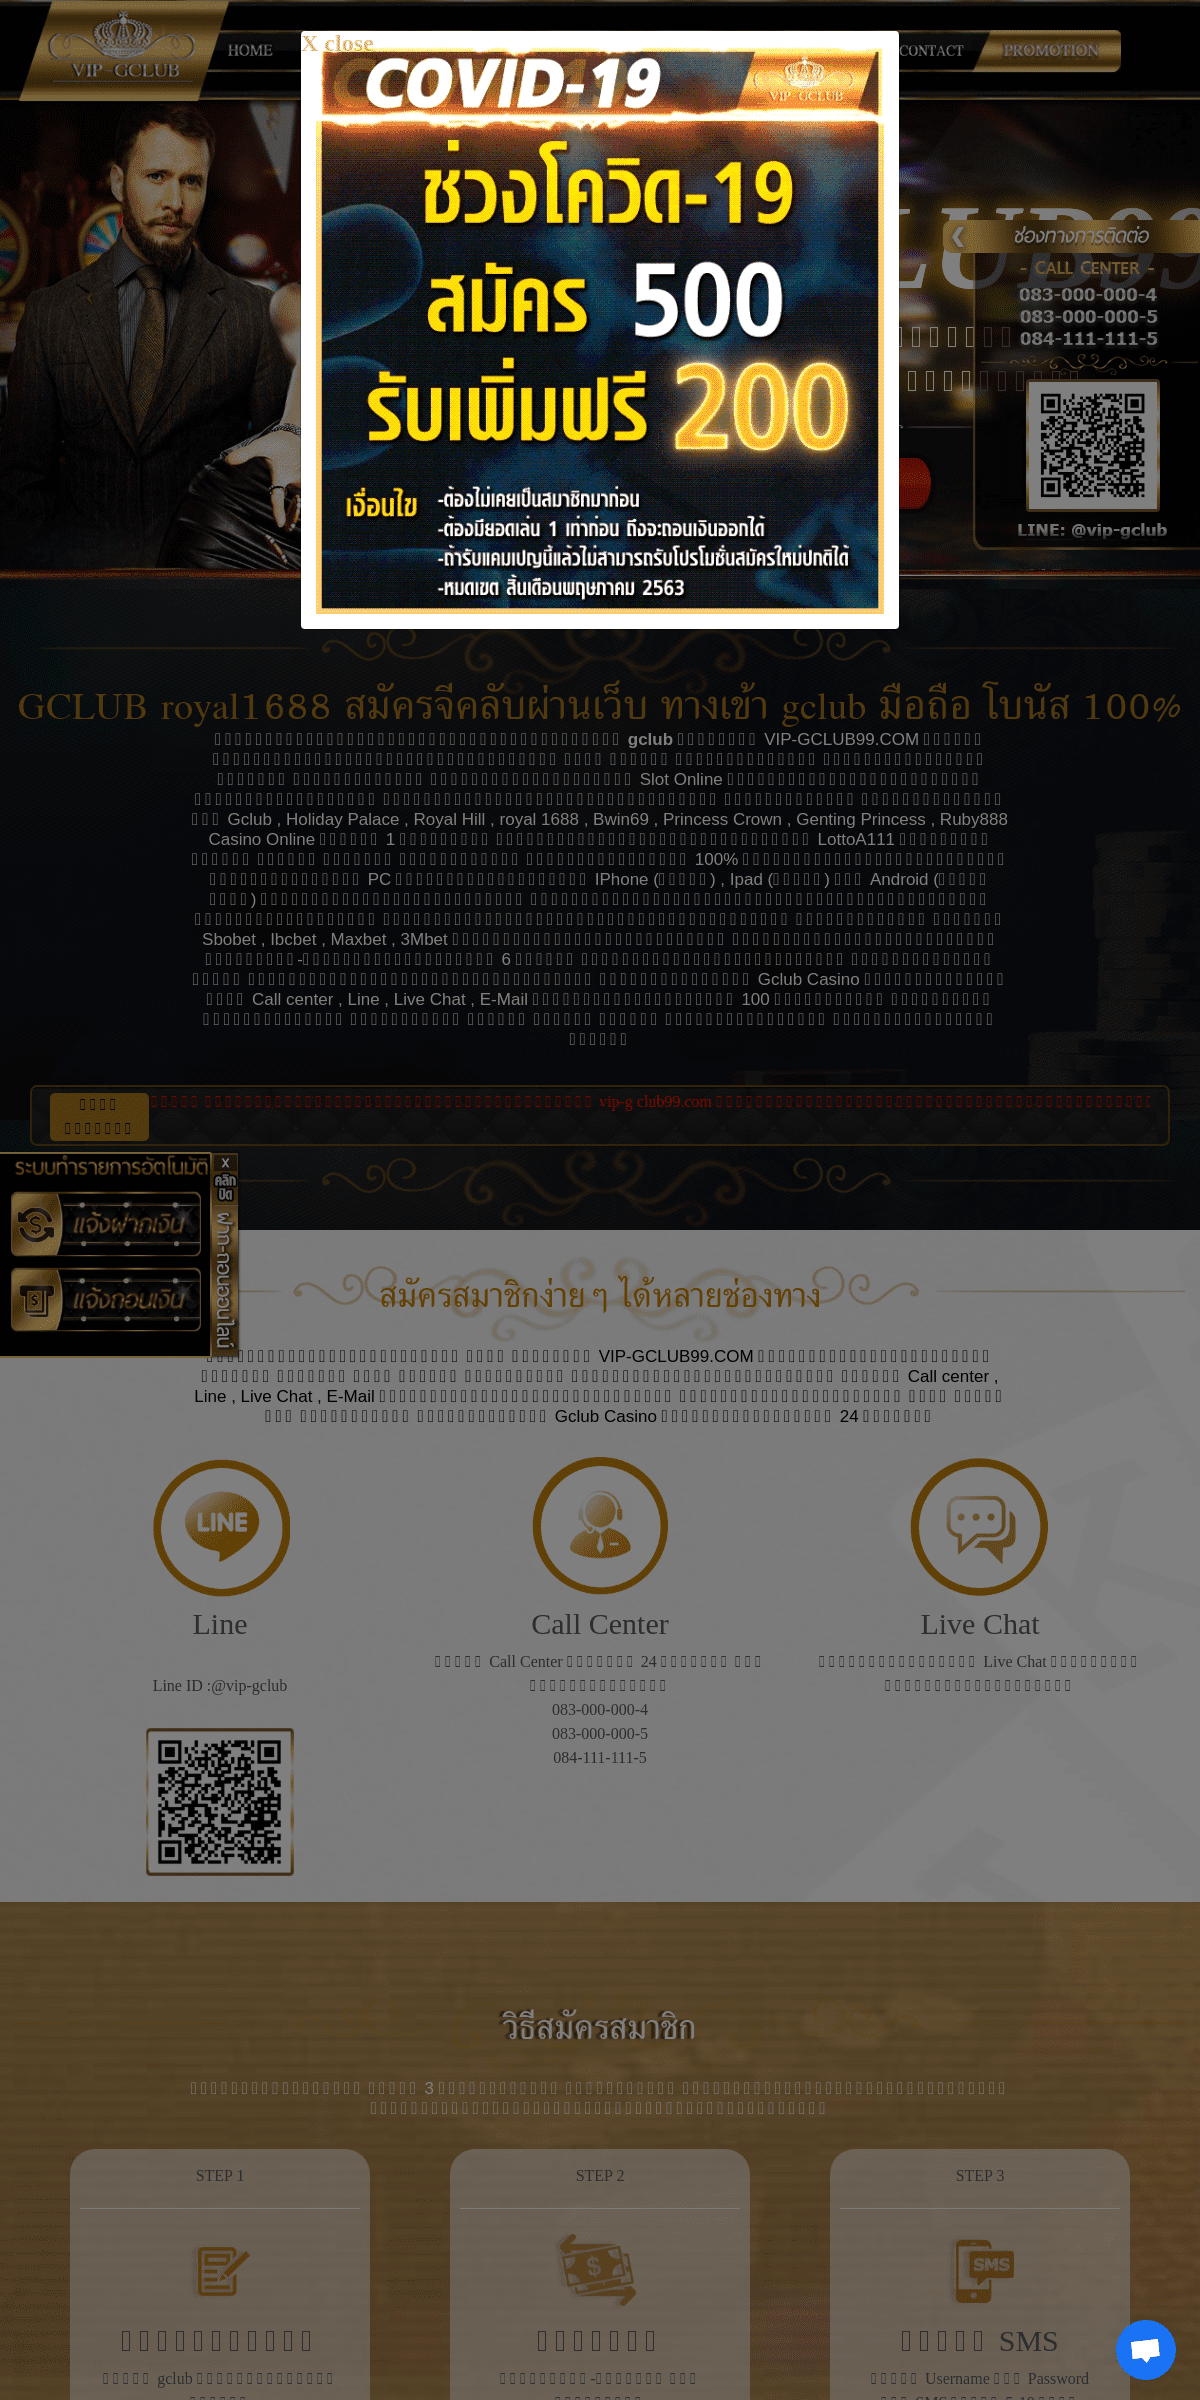 ArchiveBay.com - vip-gclub99.com - GCLUB royal1688 สมัครจีคลับผ่านเว็บ ทางเข้า gclub มือถือ